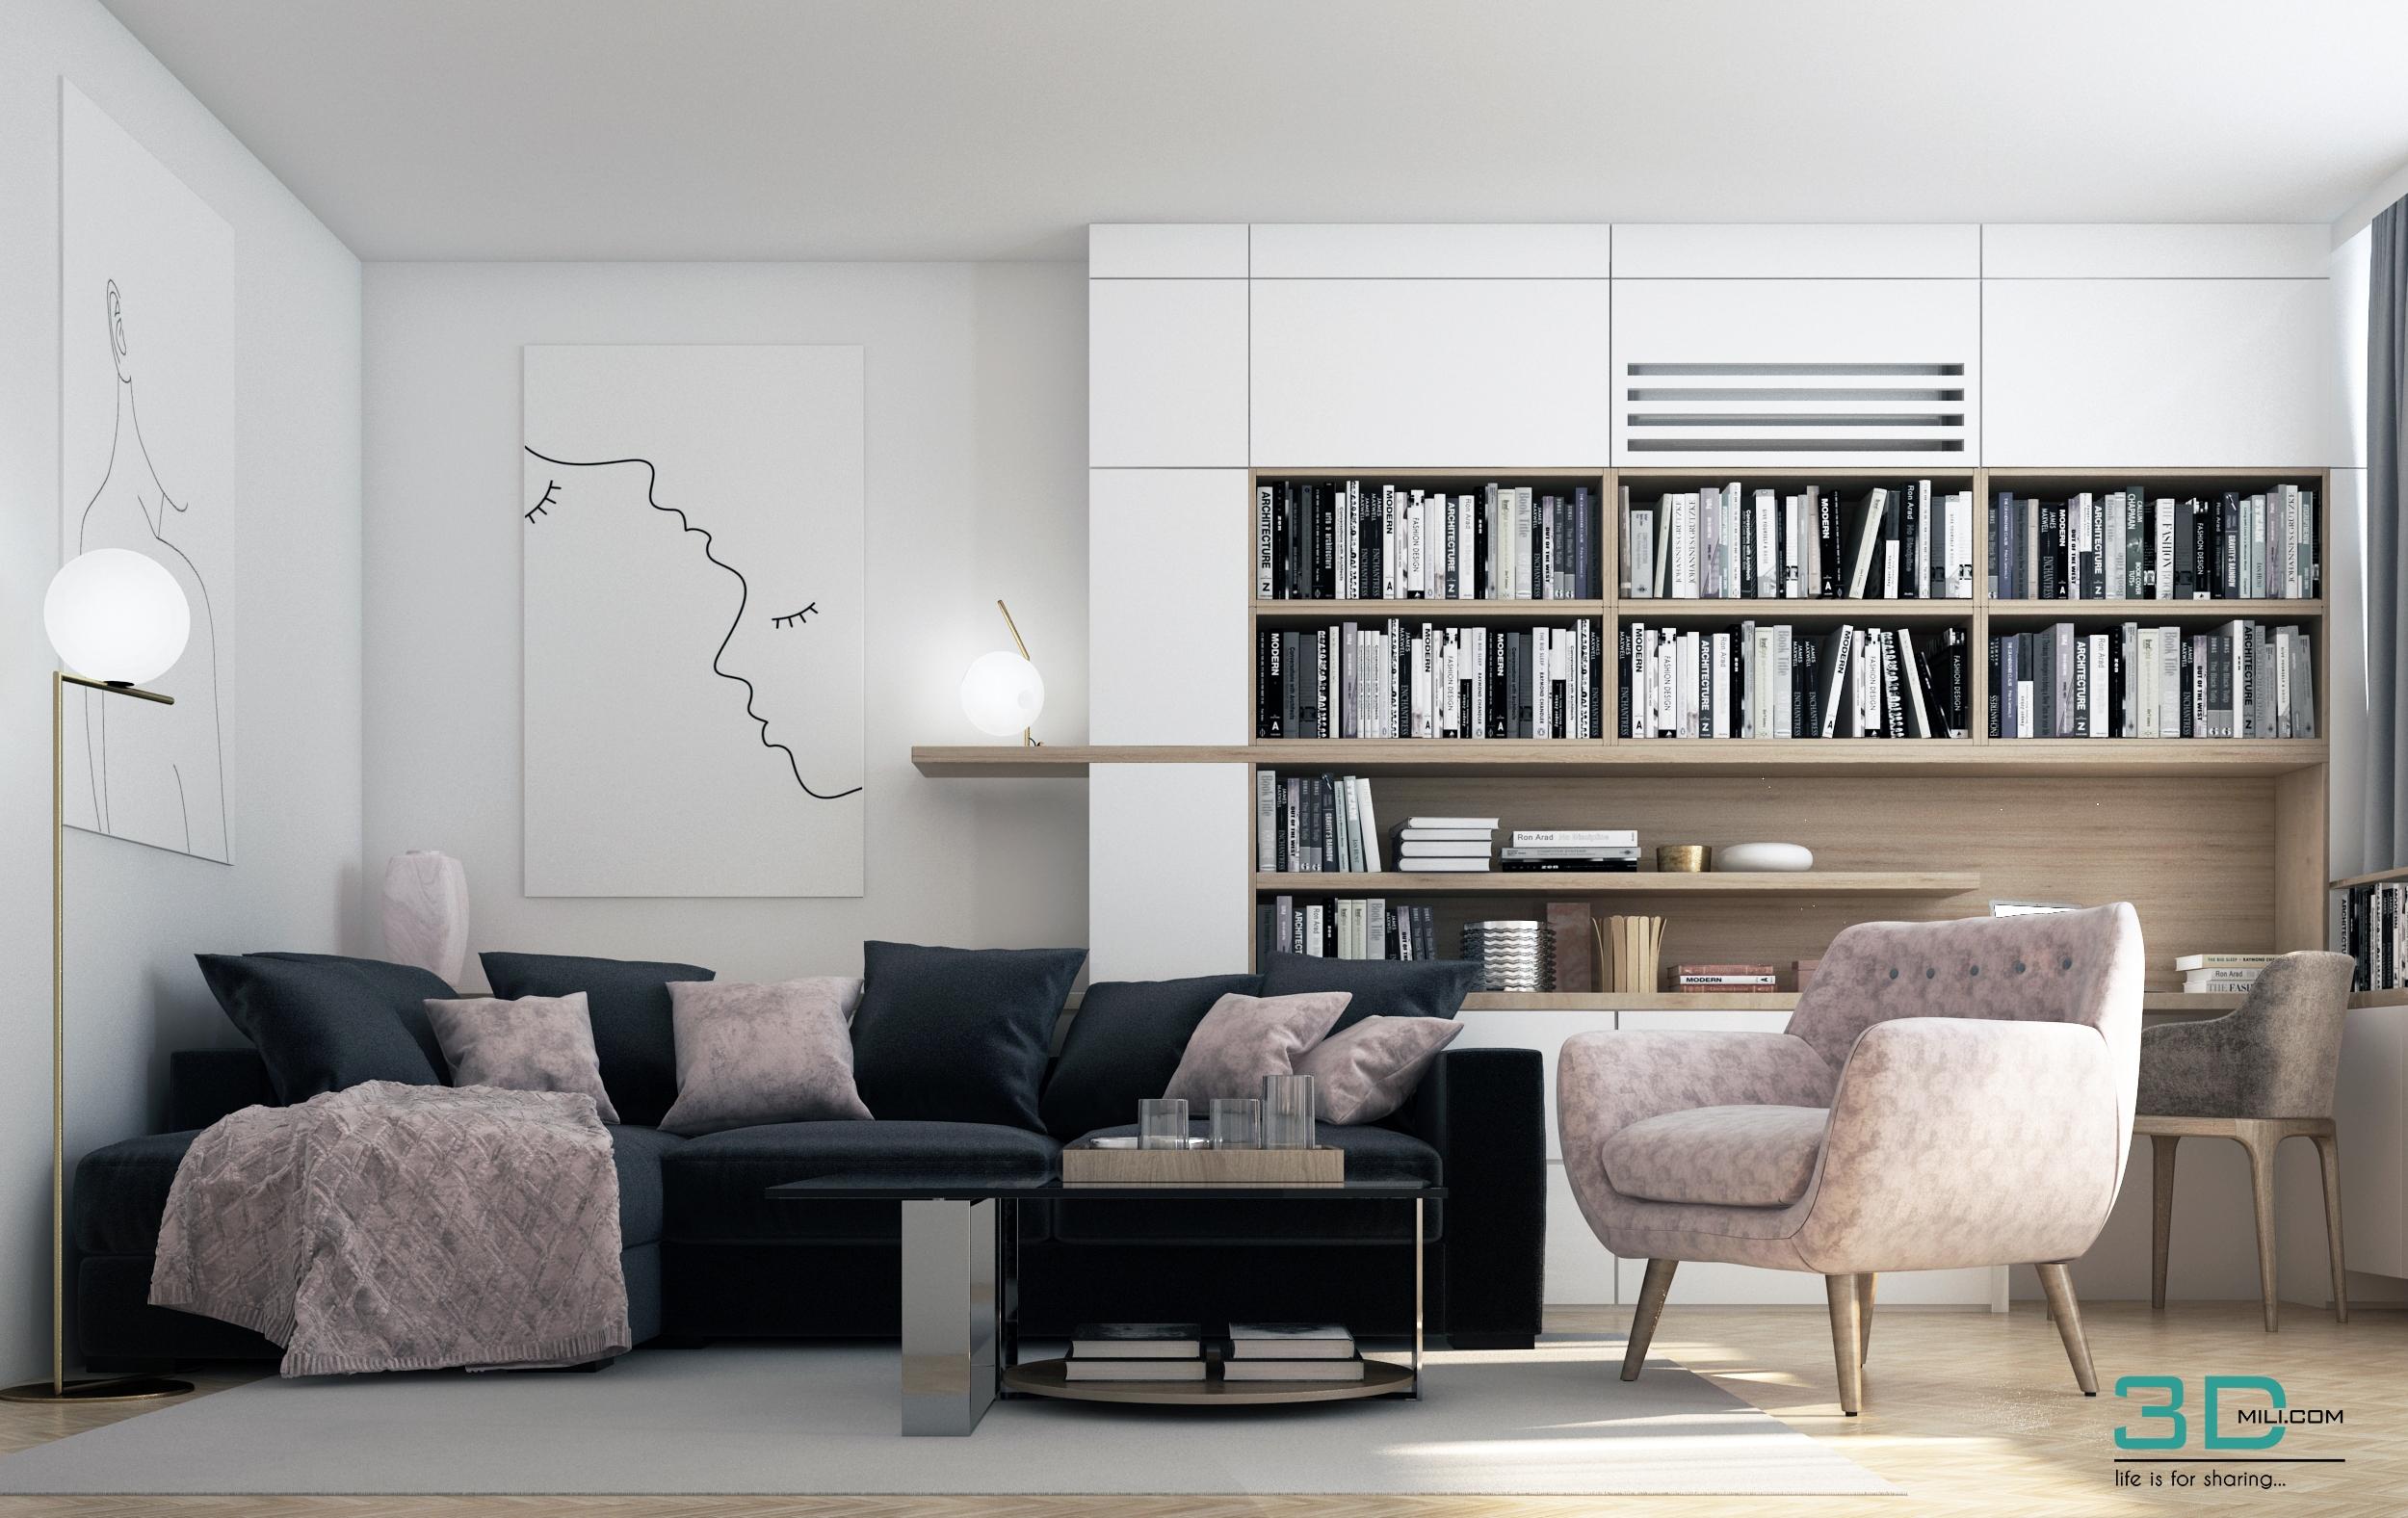 lovely living room 3d model | Living room - 3D Mili - Download 3D Model - Free 3D Models ...